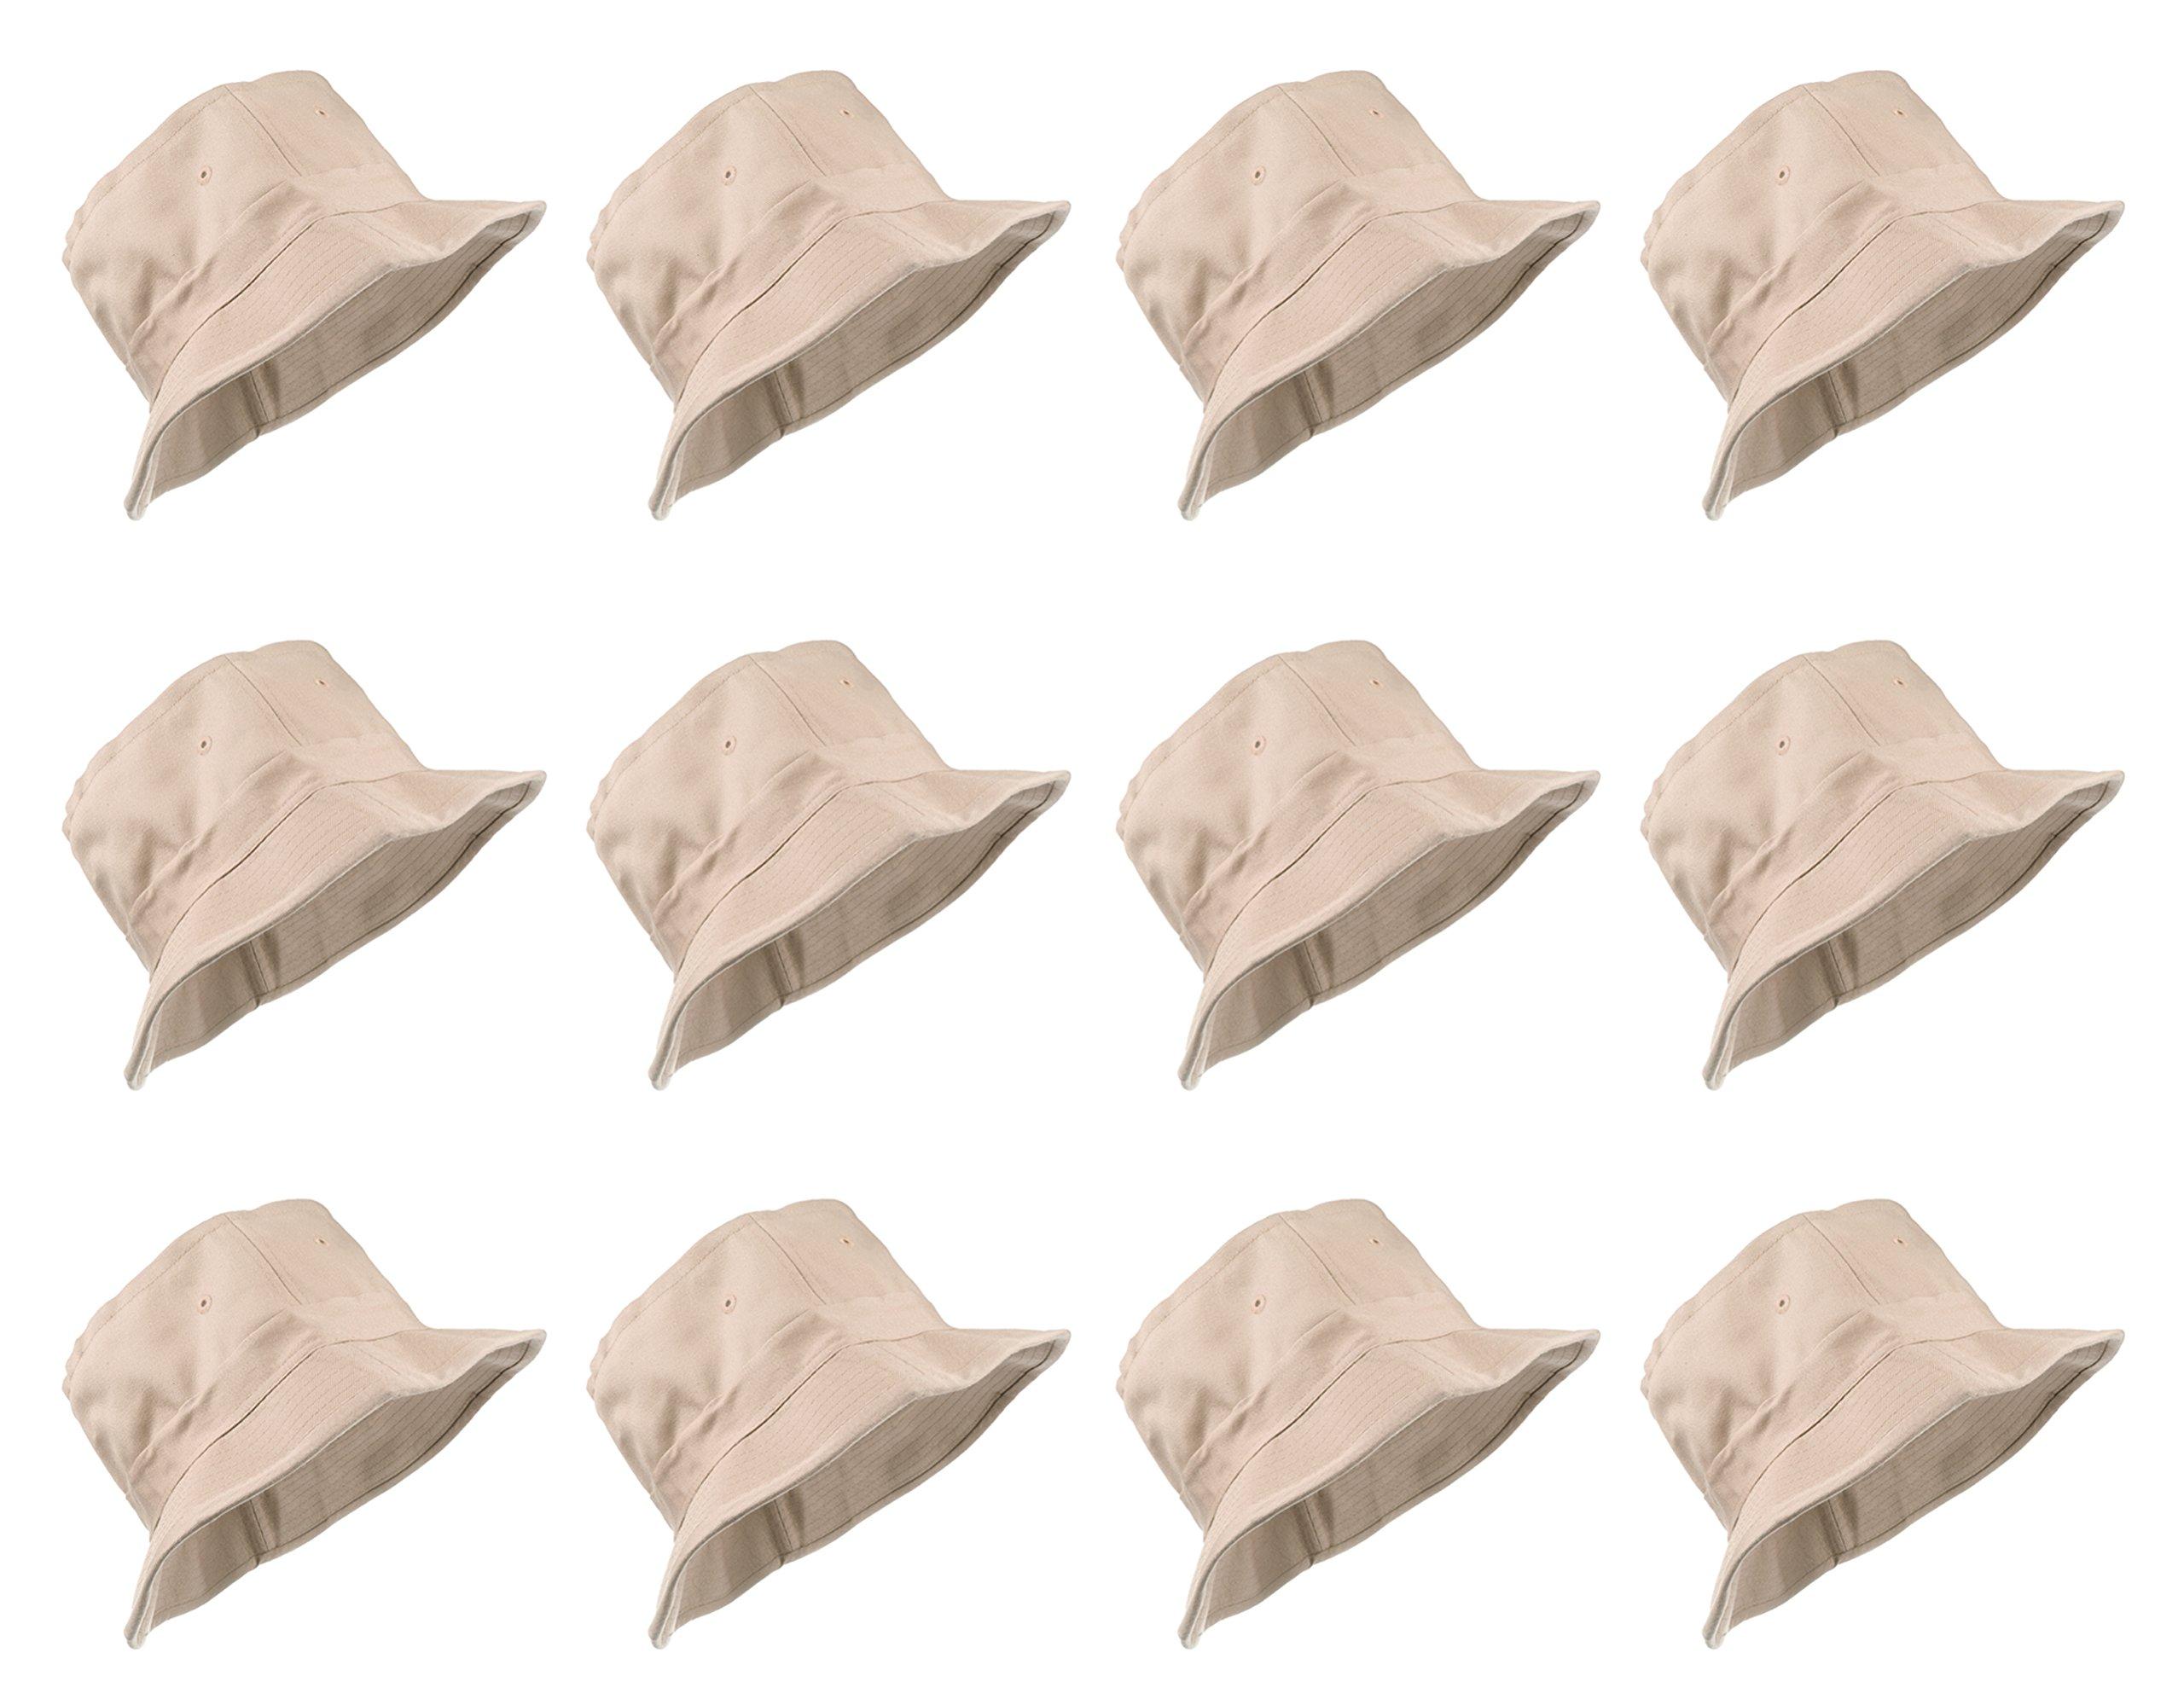 Enimay 12 Pack of Classic Style Bucket Hats Soild Colors Many Styles Khaki